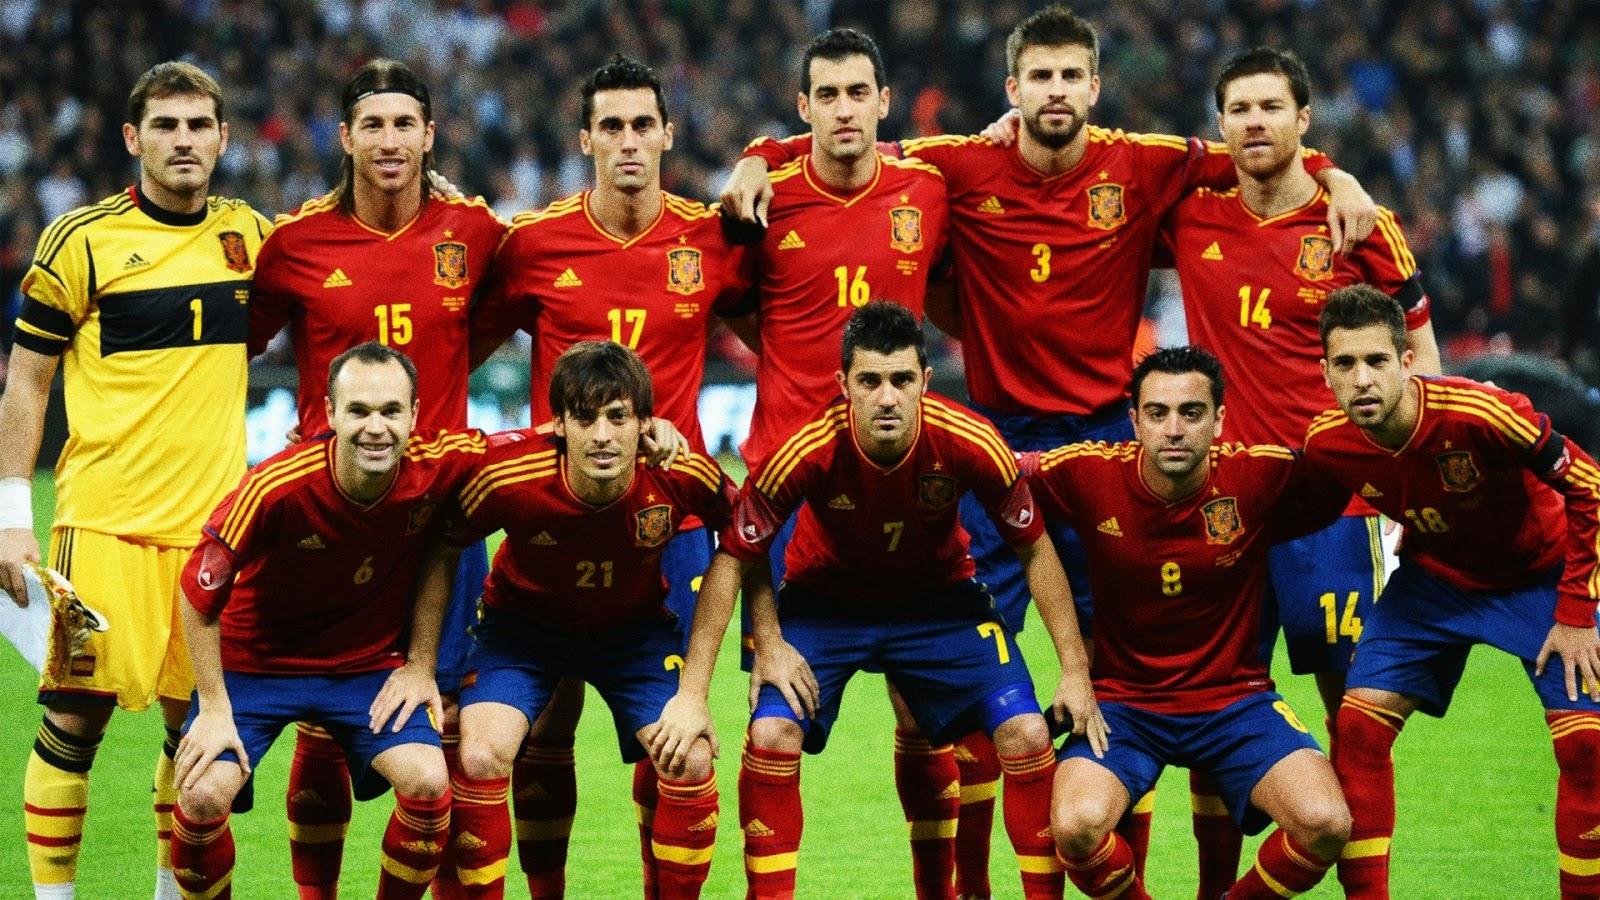 wallpaper-national-team-spain